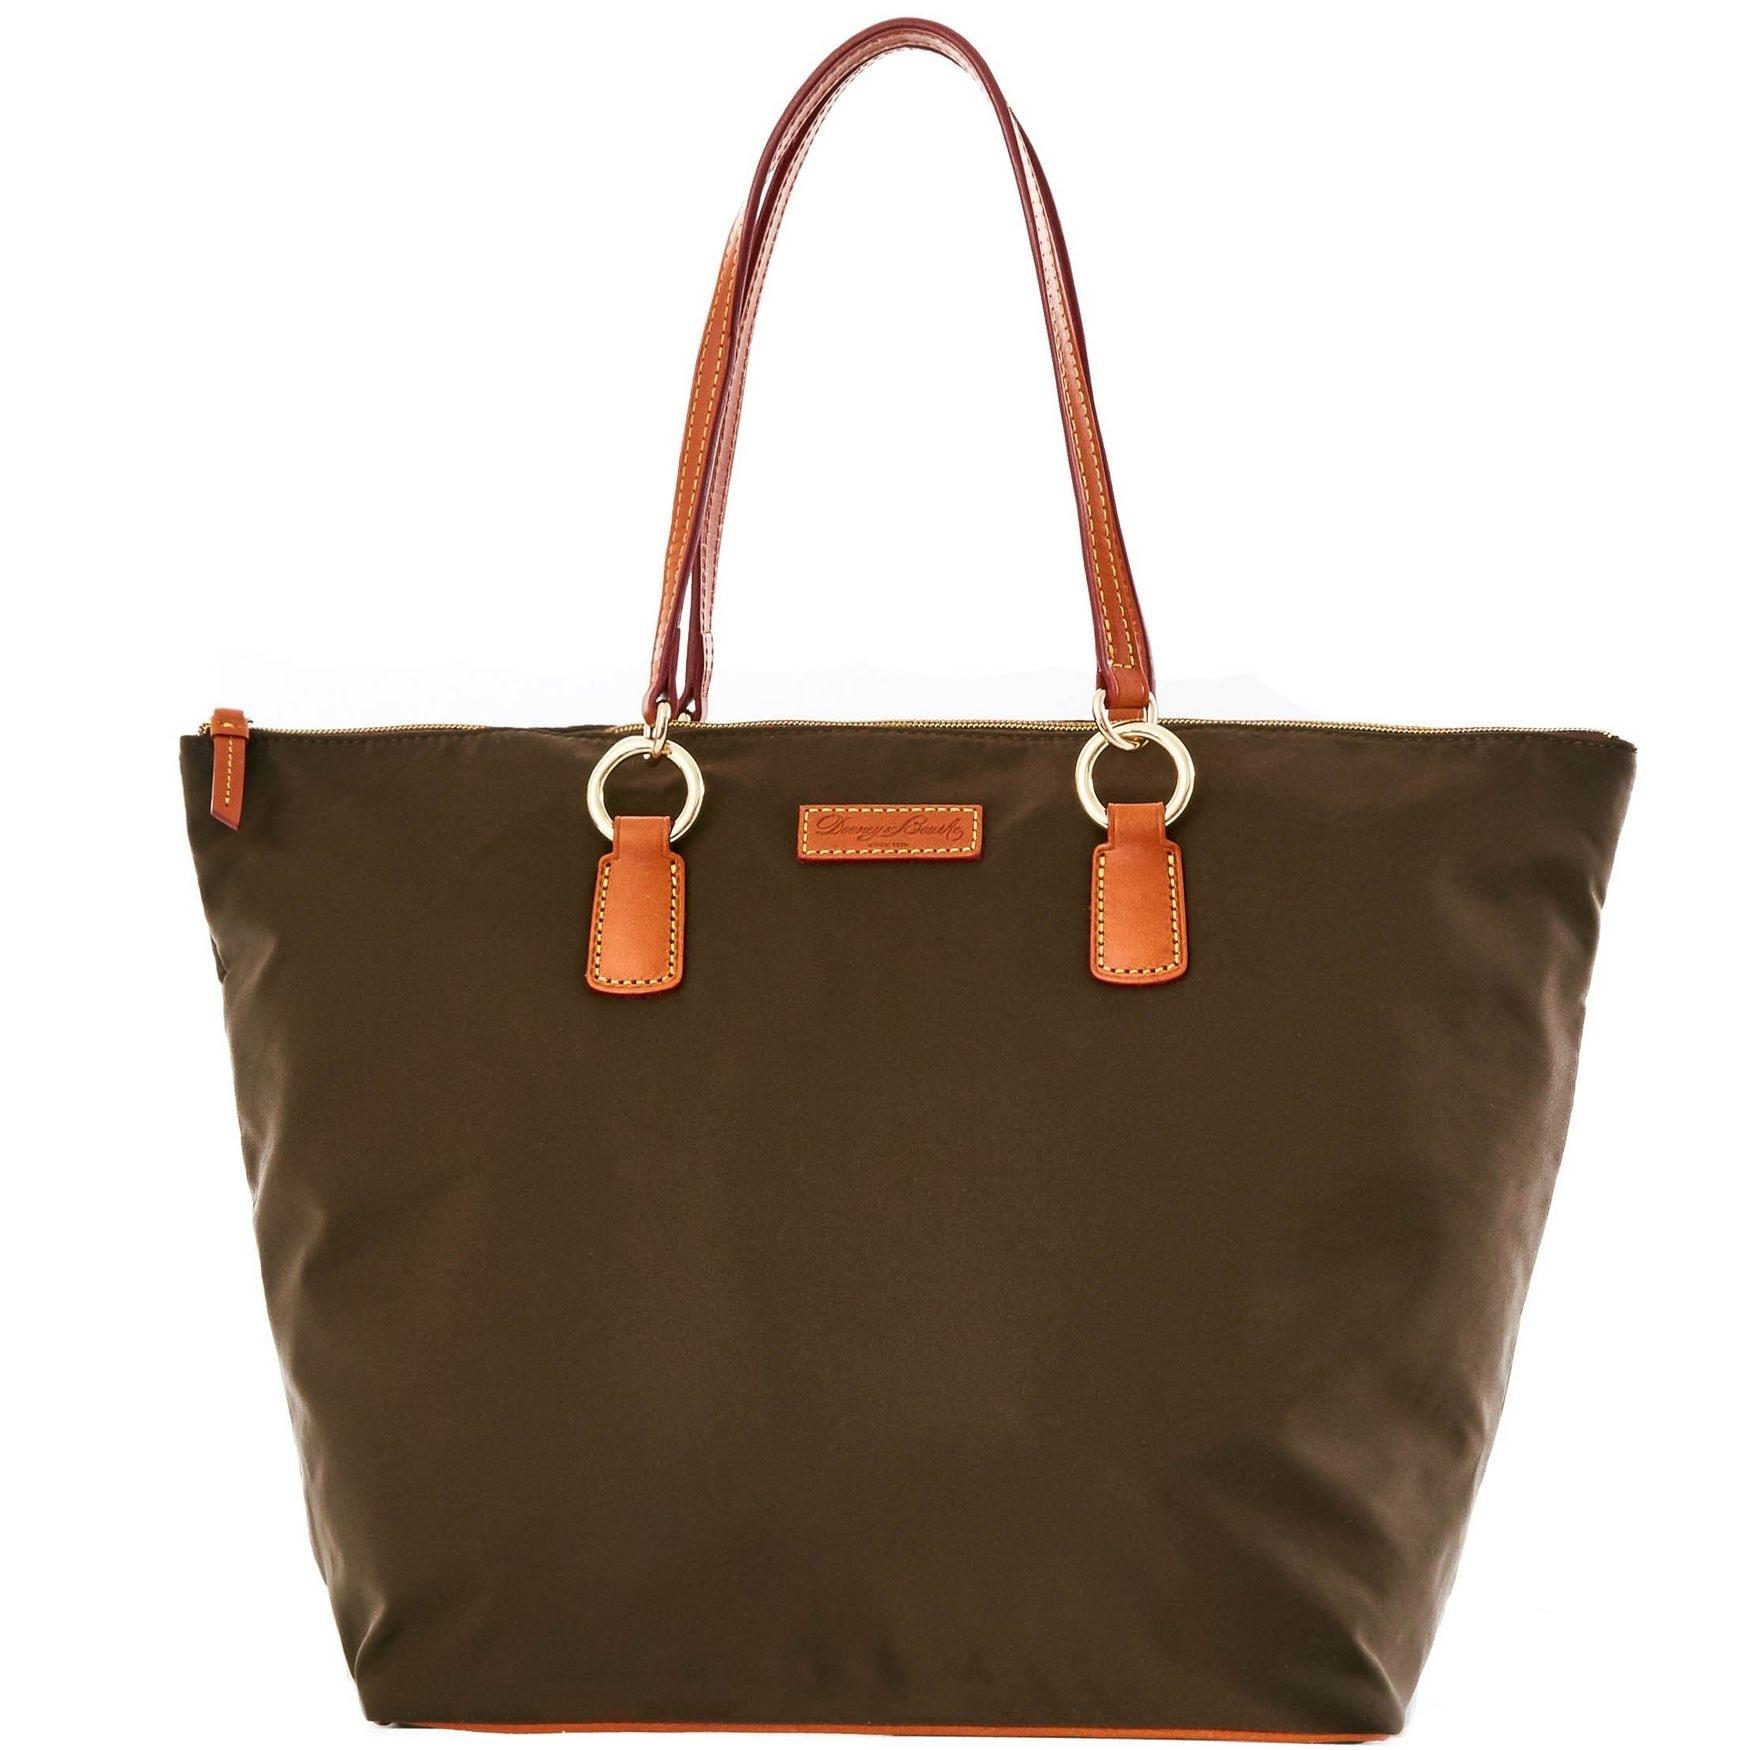 b0523ec9e Designer Handbags | Find Great Designer Store Deals Shopping at Overstock